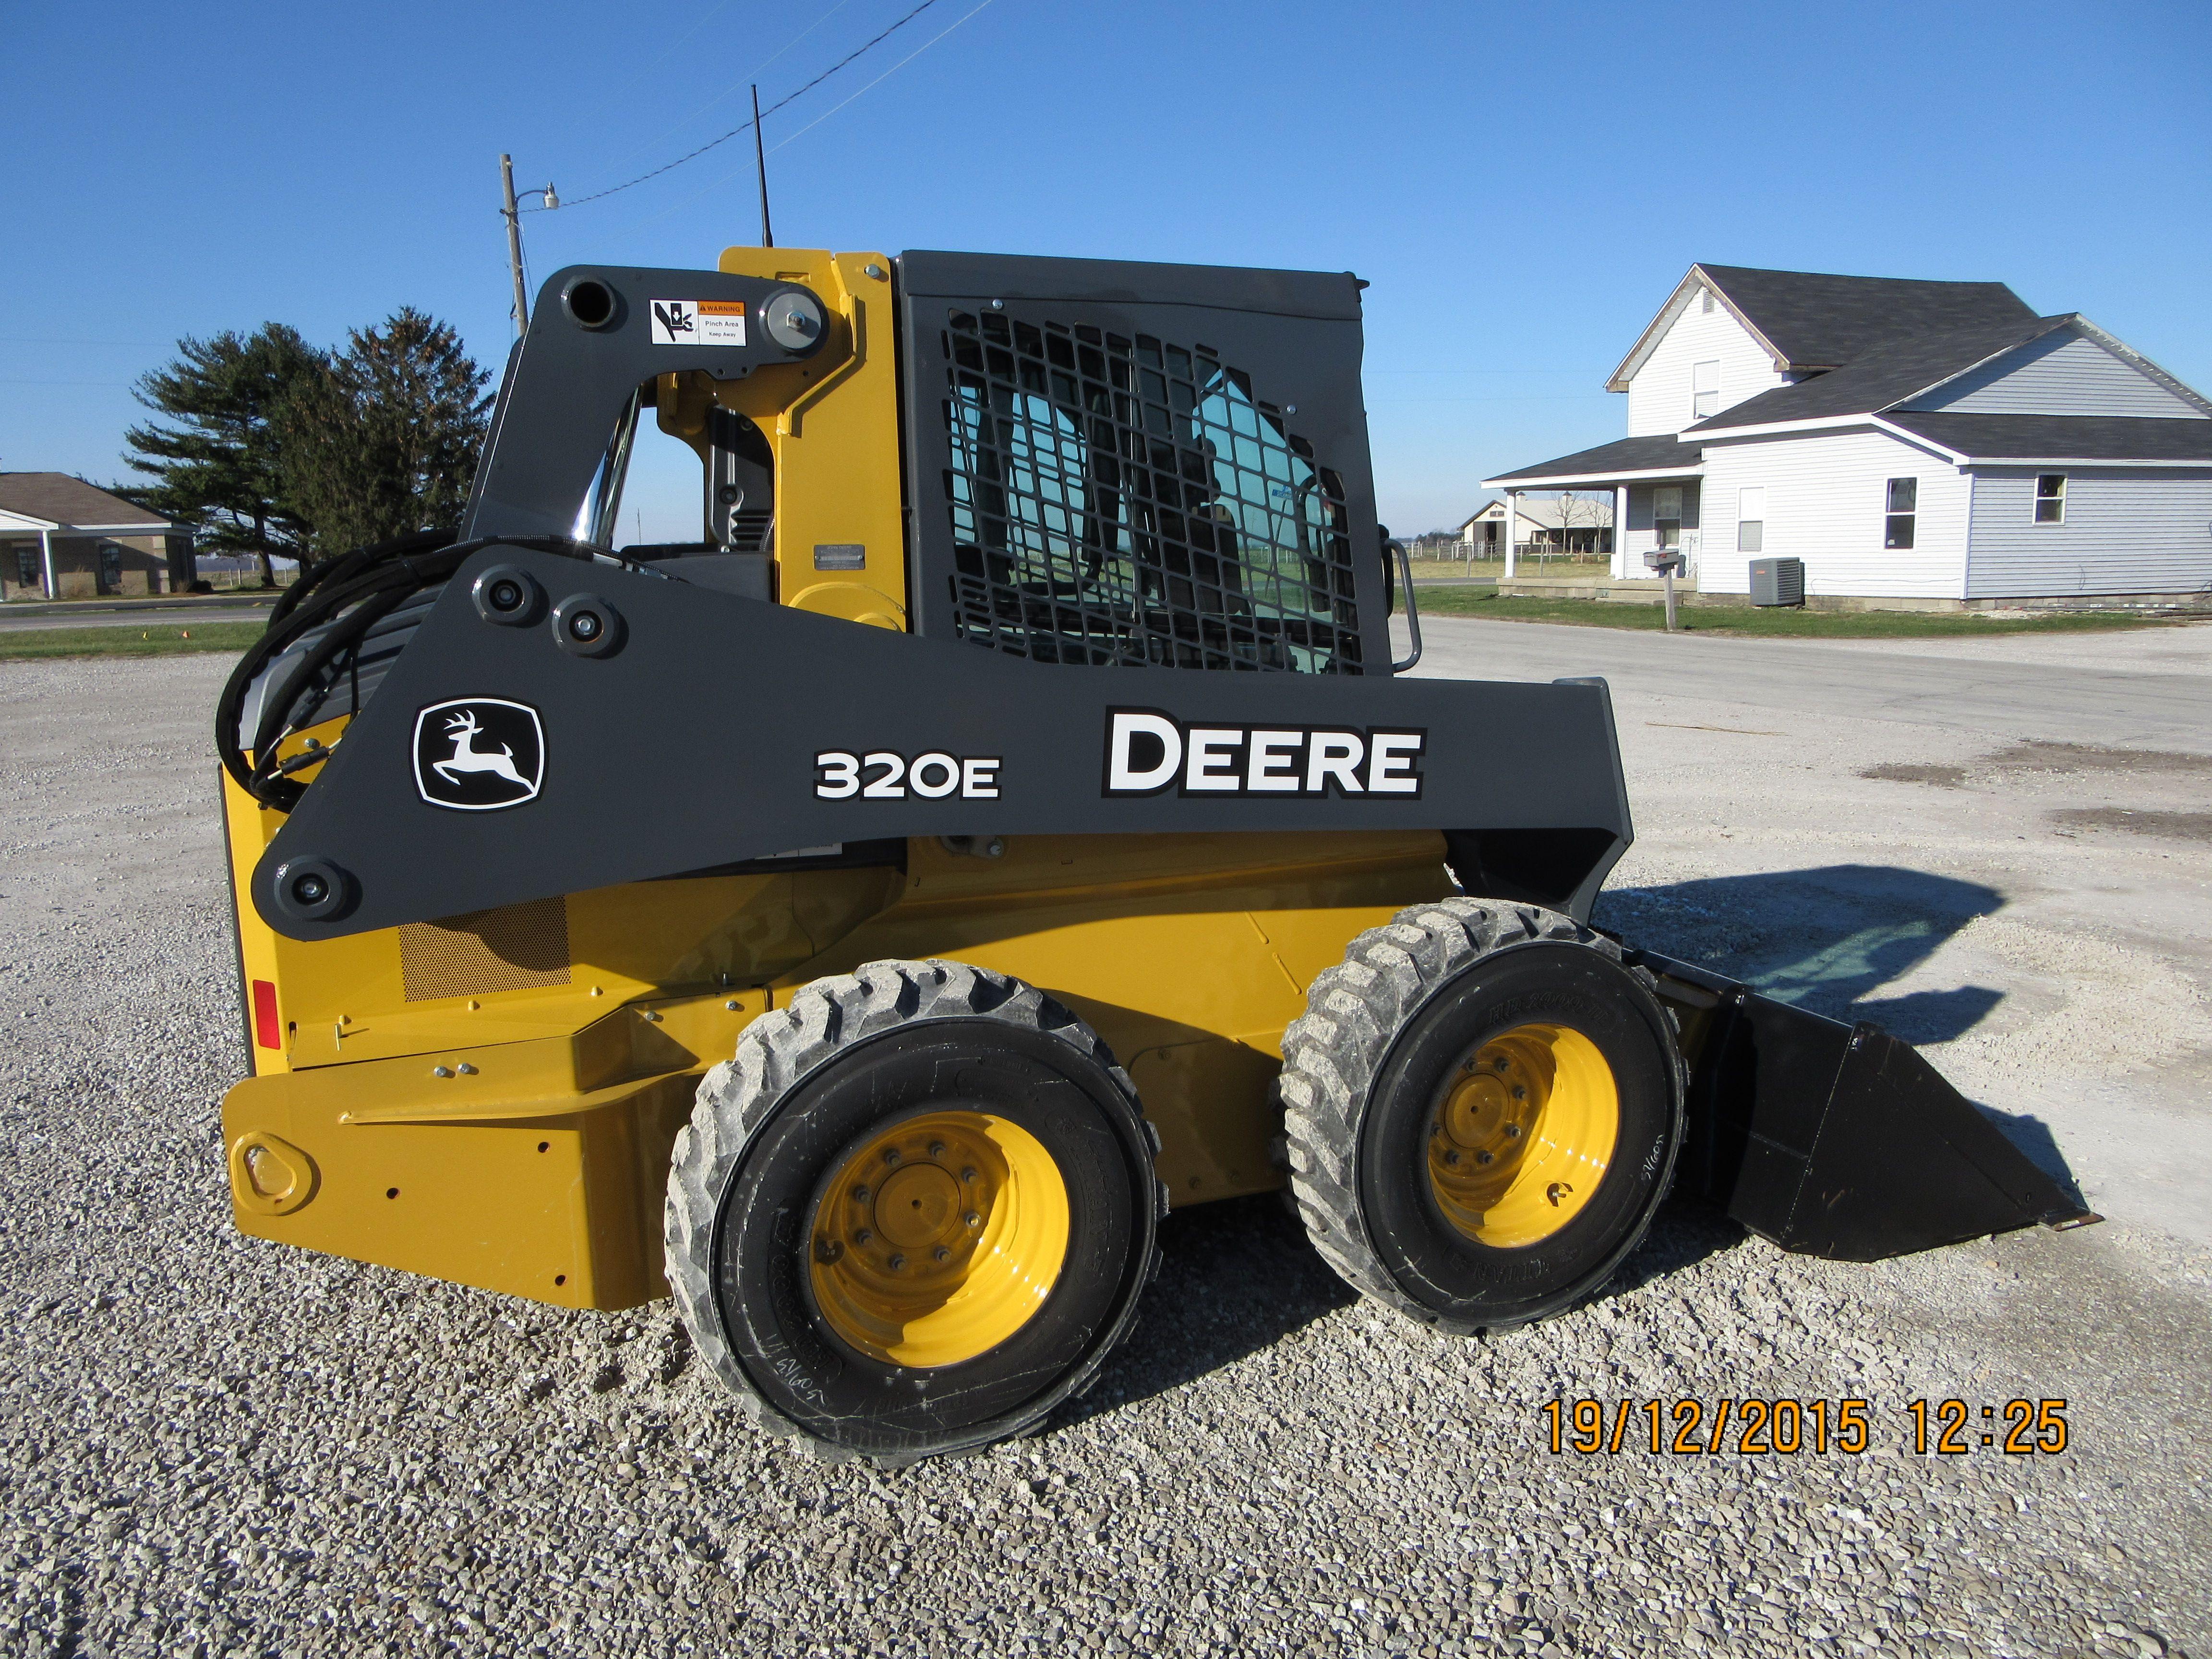 John Deere 320e Skid Steer Loader Jd Construction Equipment Door Closure Wiring Diagram 279c Cat